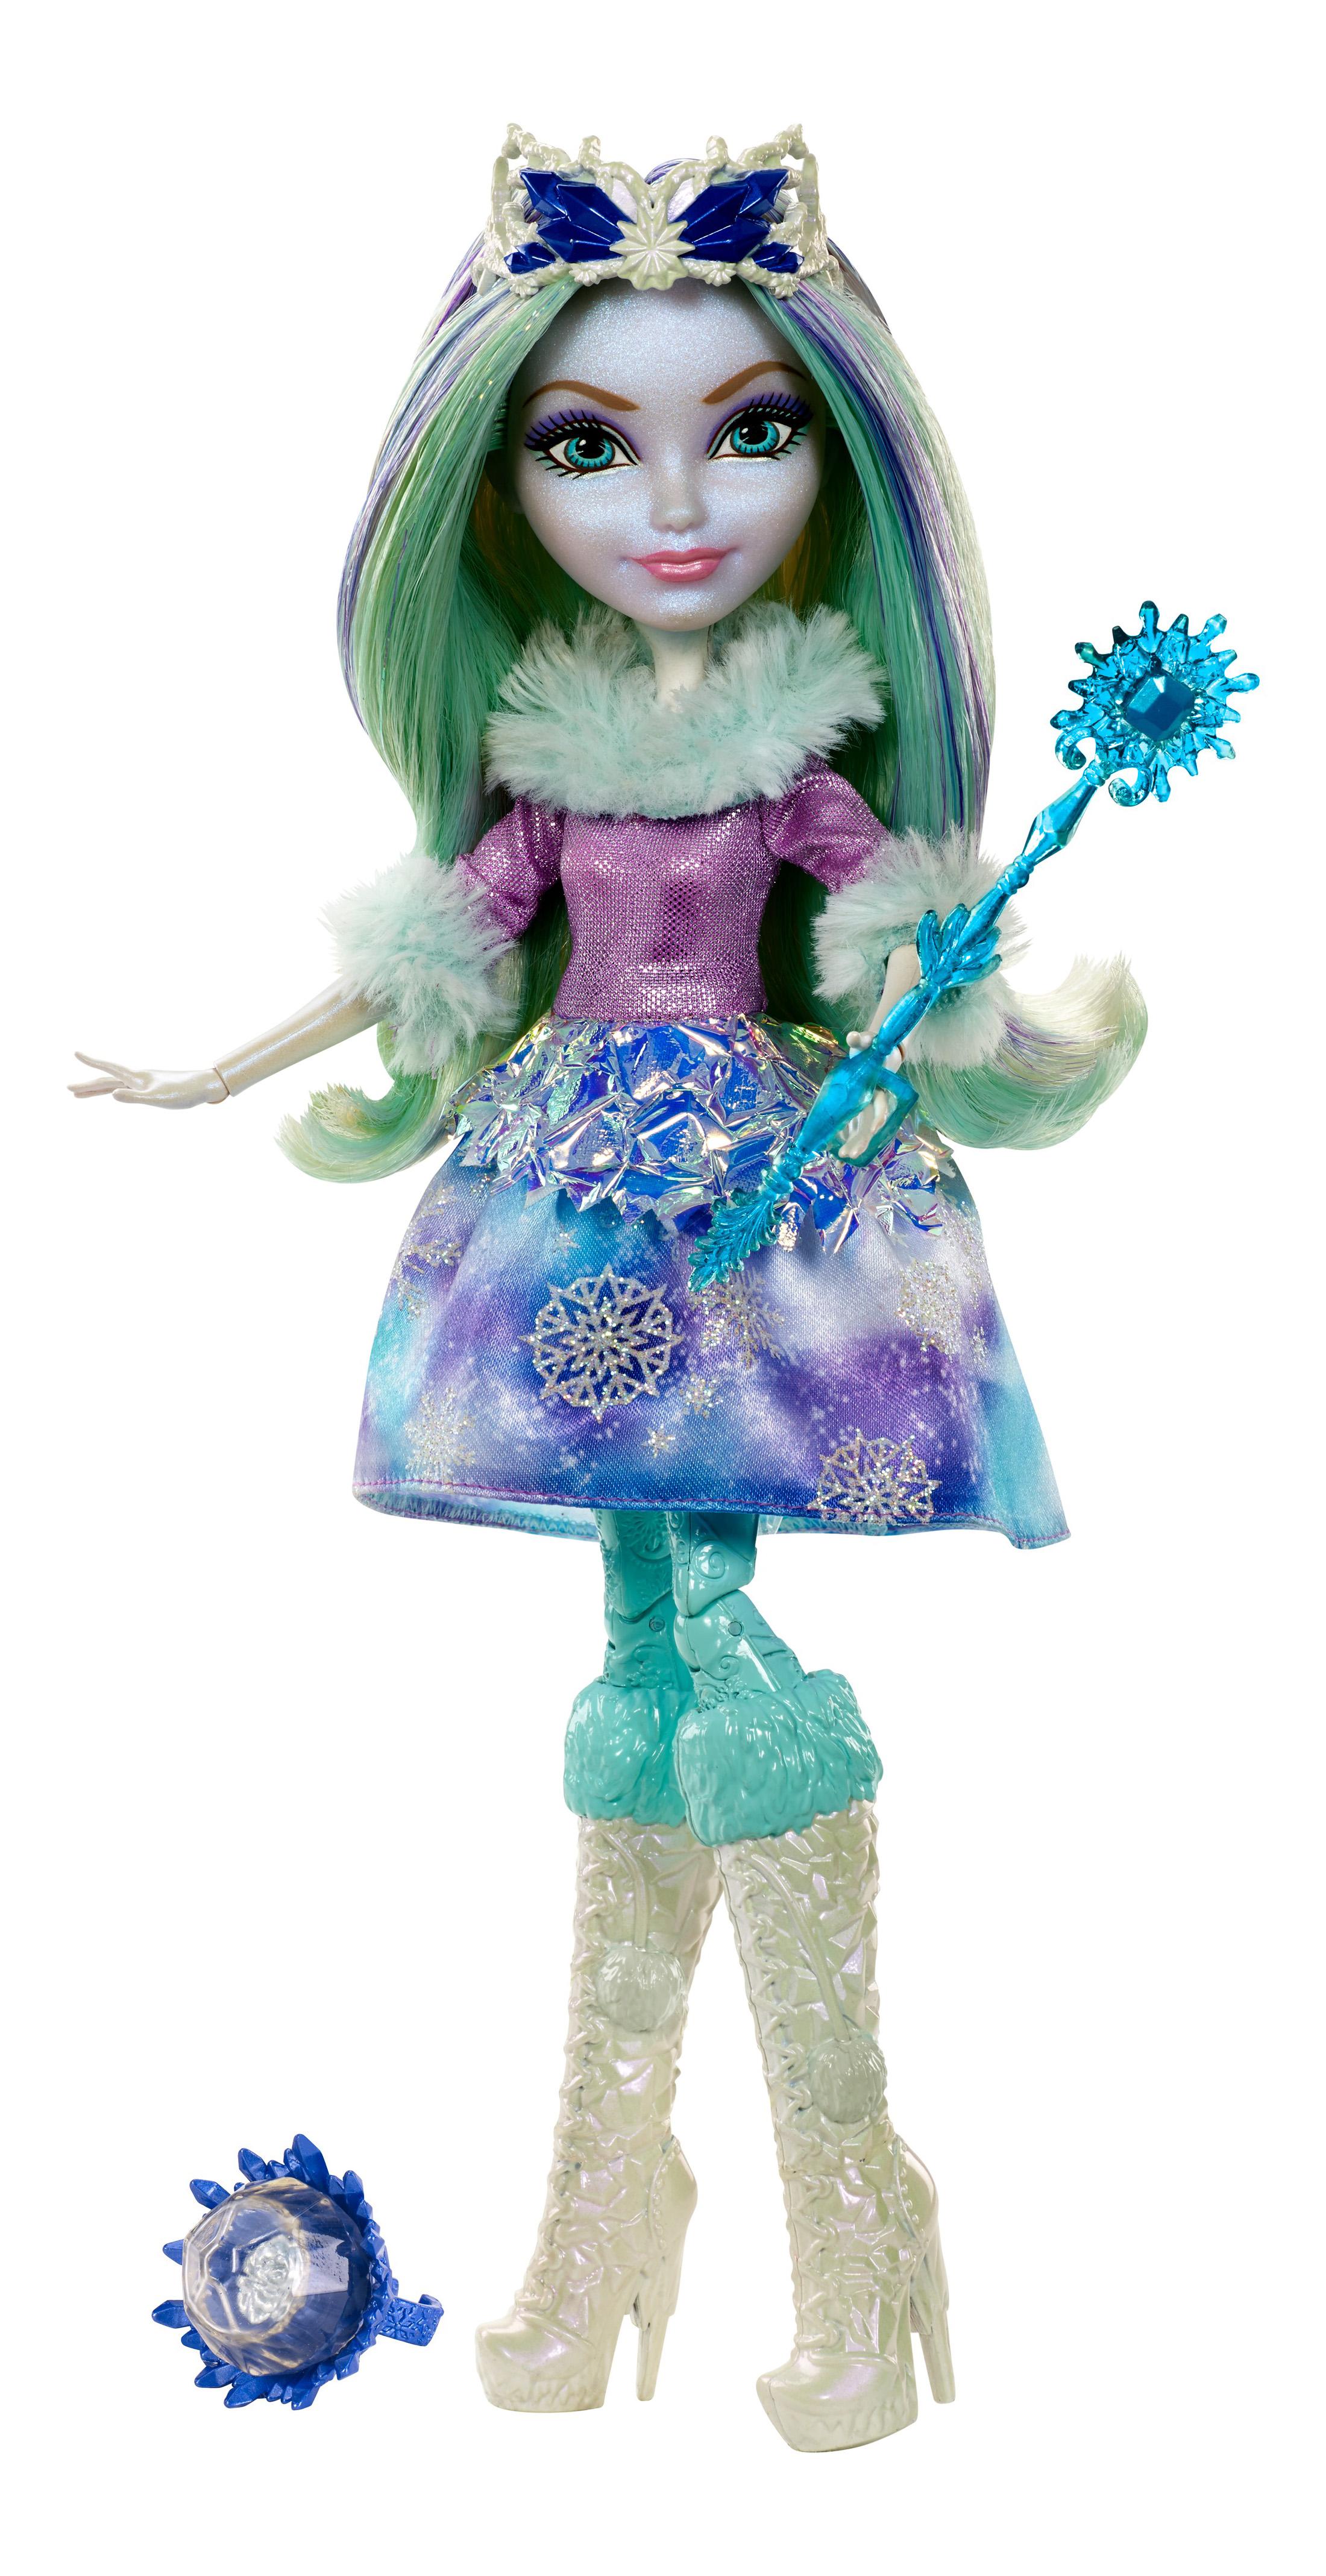 Купить Кукла Ever After High Кристал Финтер из коллекции Заколдованная зима, Куклы